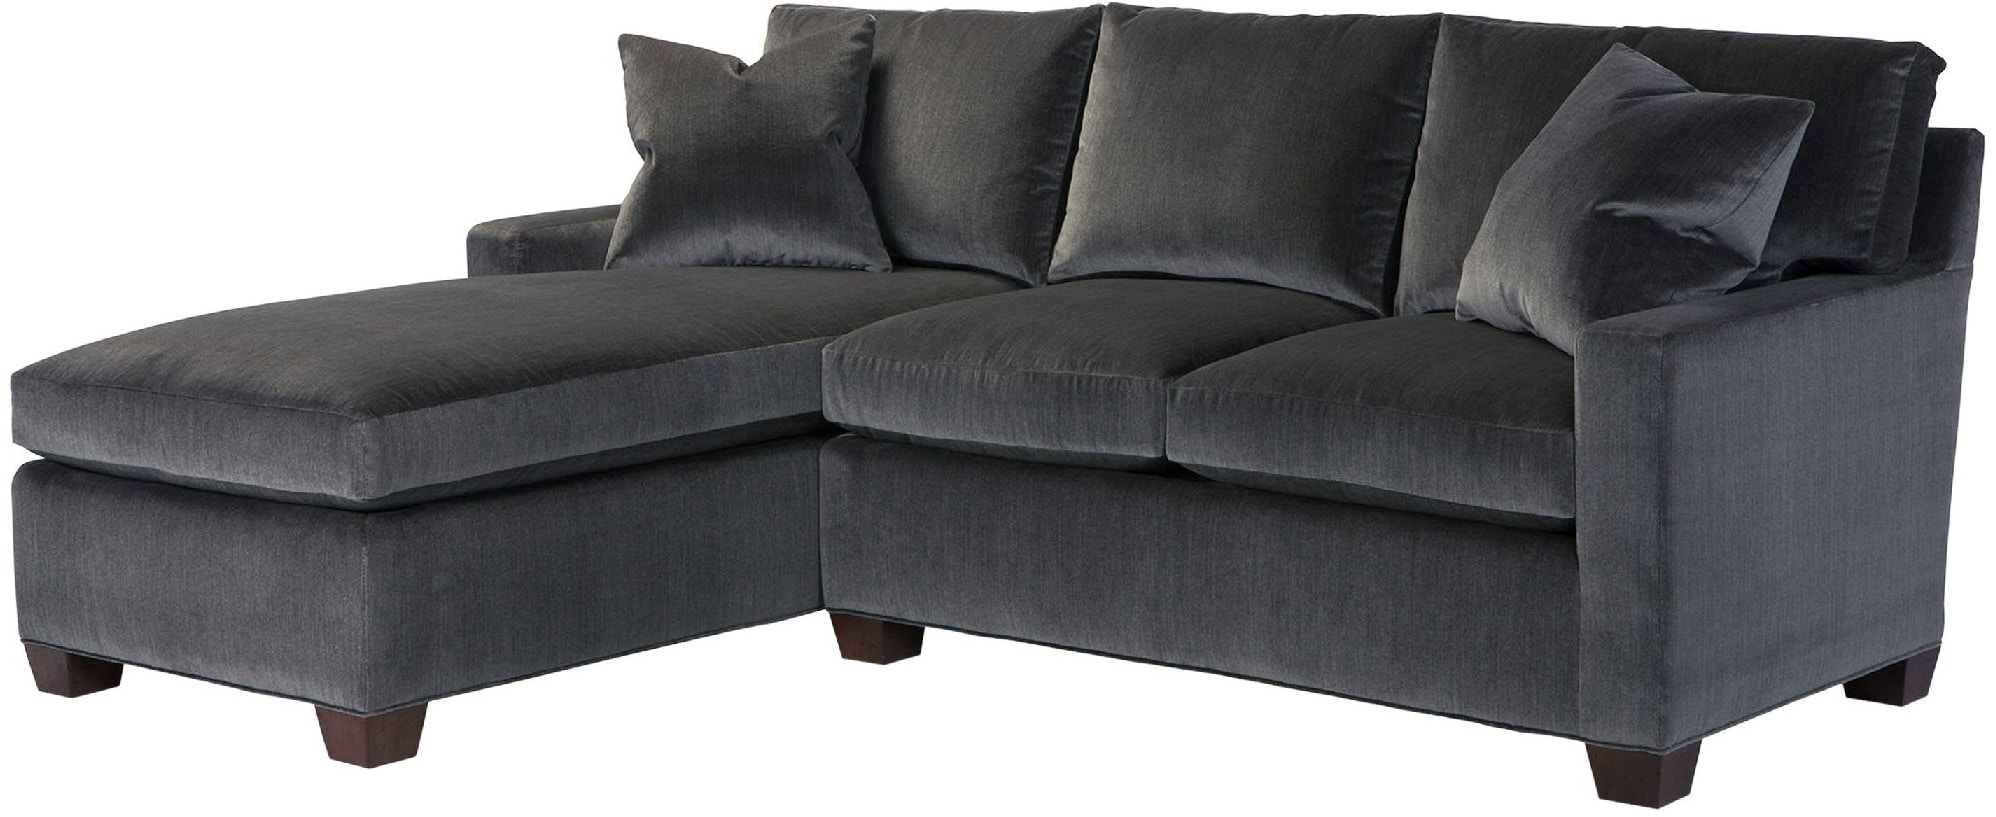 Theodore Alexander Living Room Miramar C364 57 JA BEC C341 31 JA BEC Gladhill Furniture